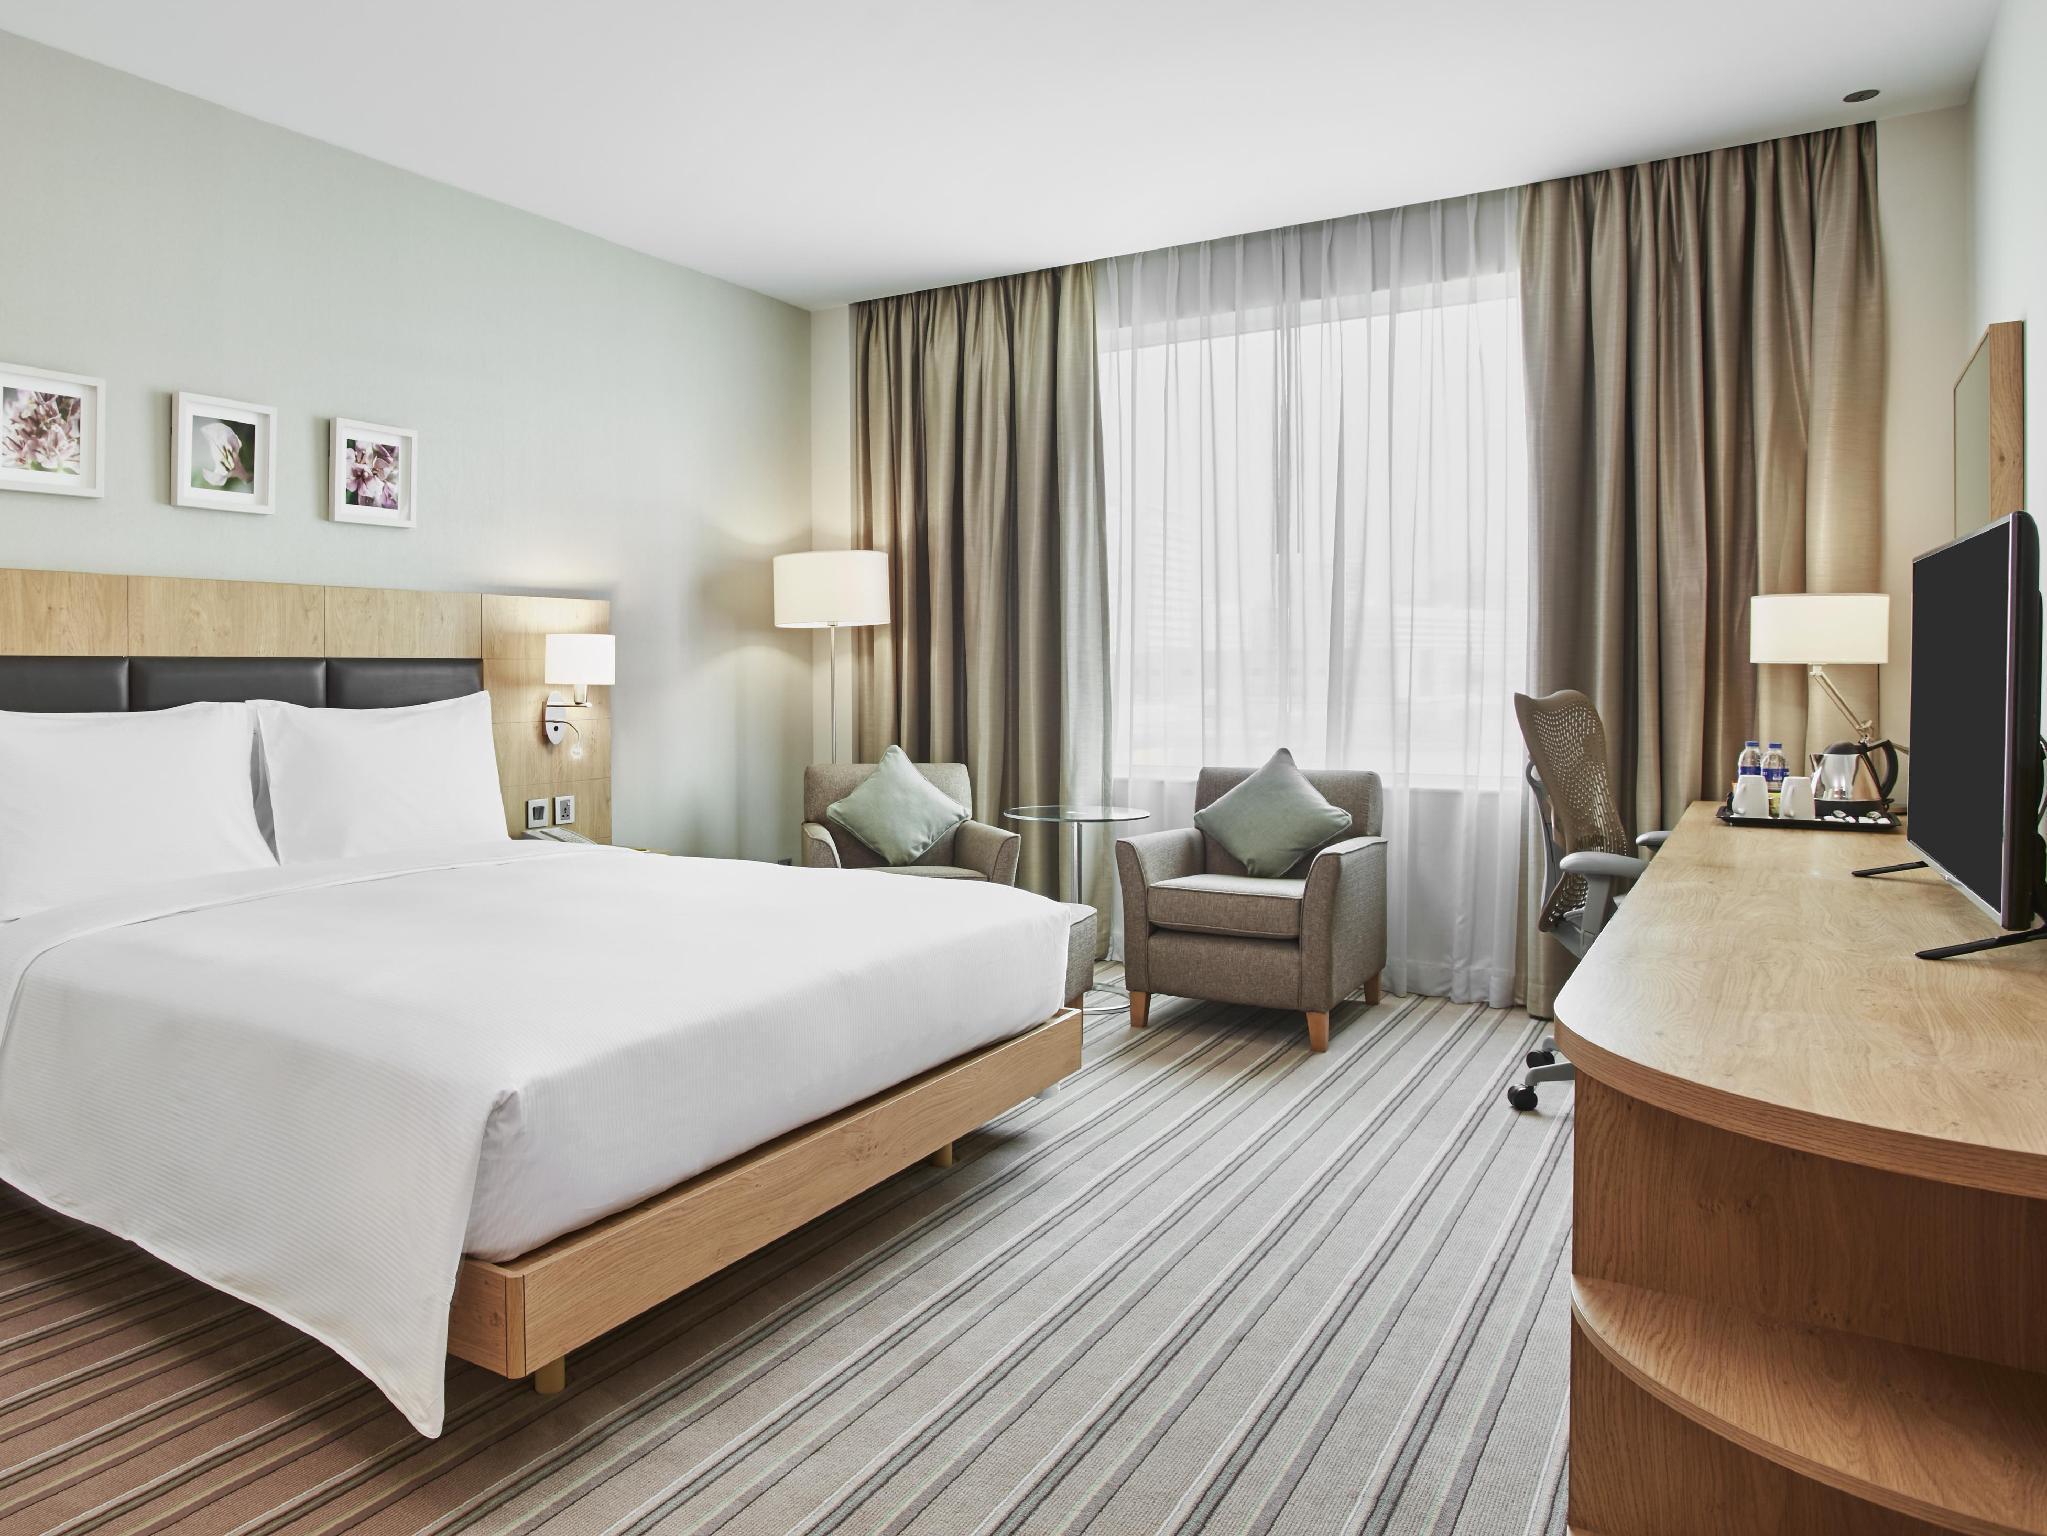 🟊🟊🟊🟊 Hilton Garden Inn Dubai Mall of The Emirates - Dubai - United Arab Emirates